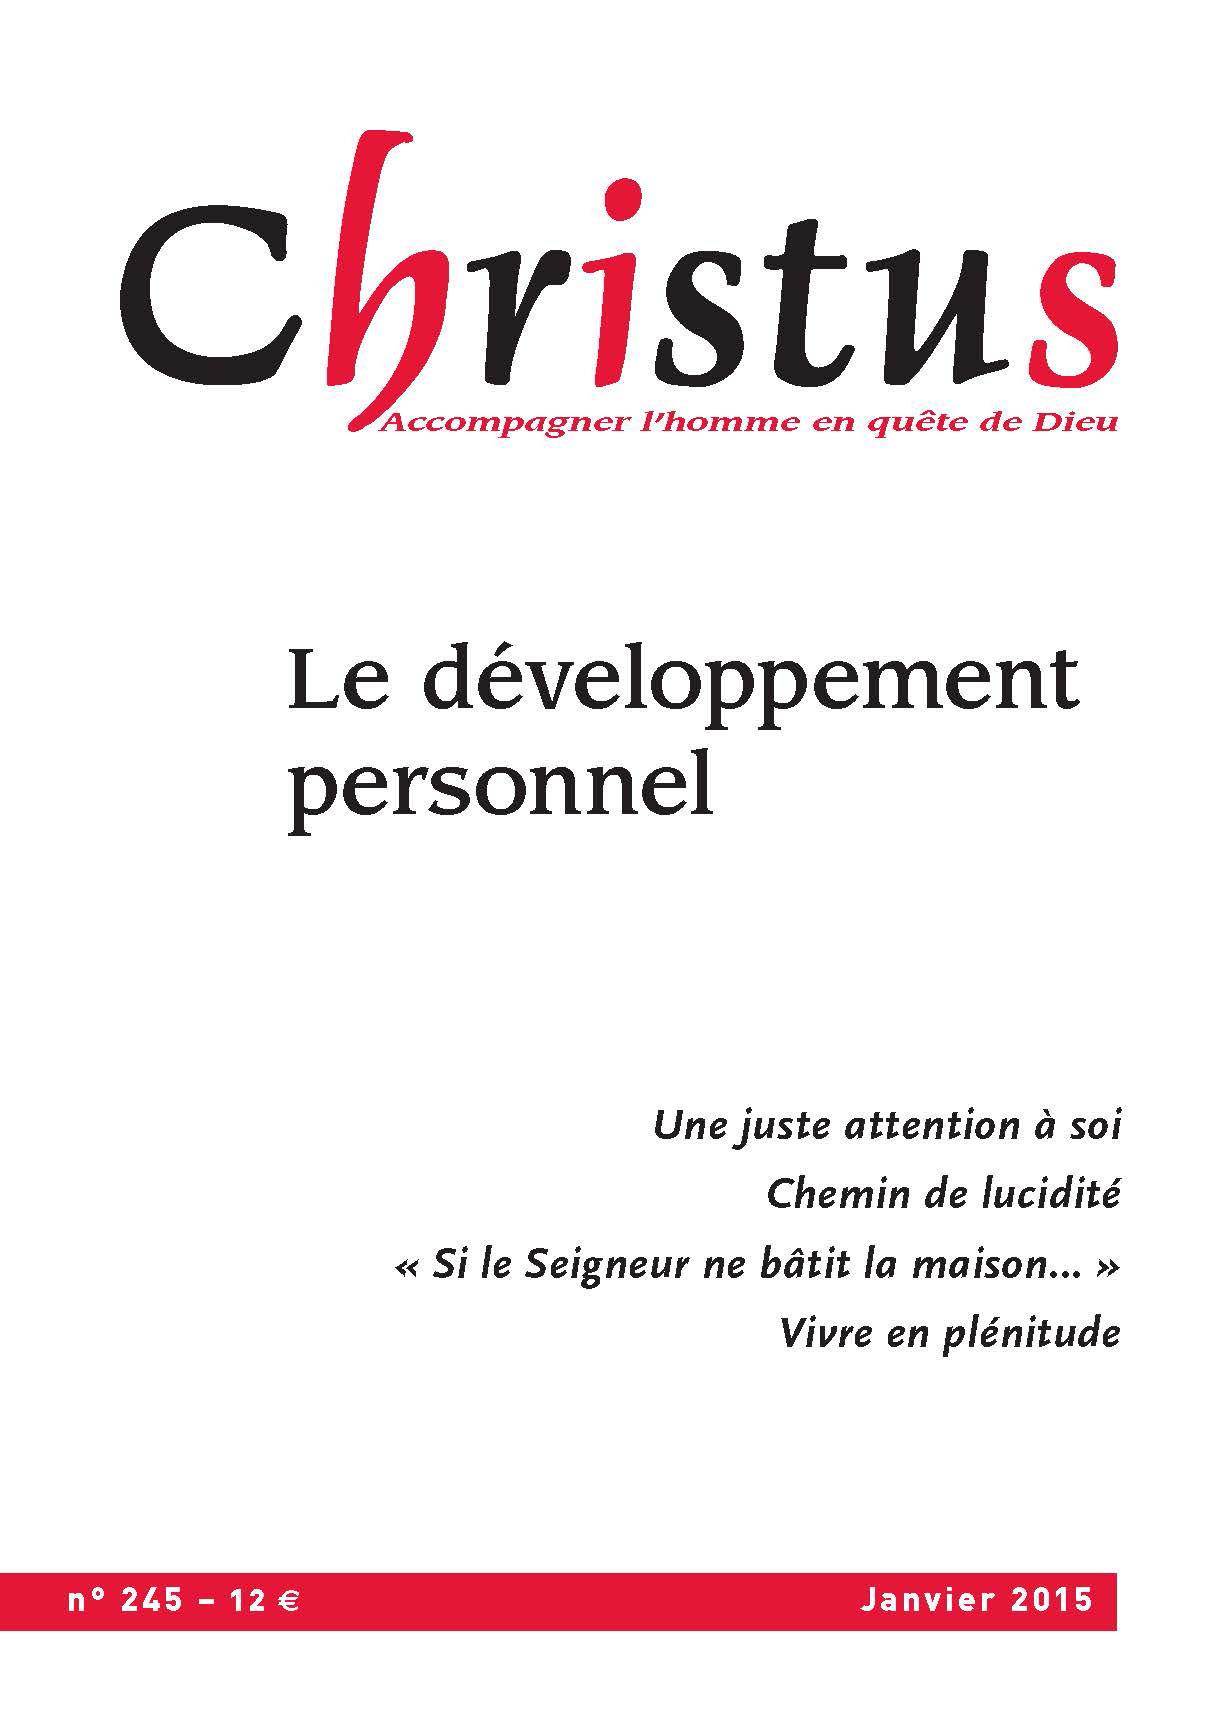 Christus Avril 2015 - N°246